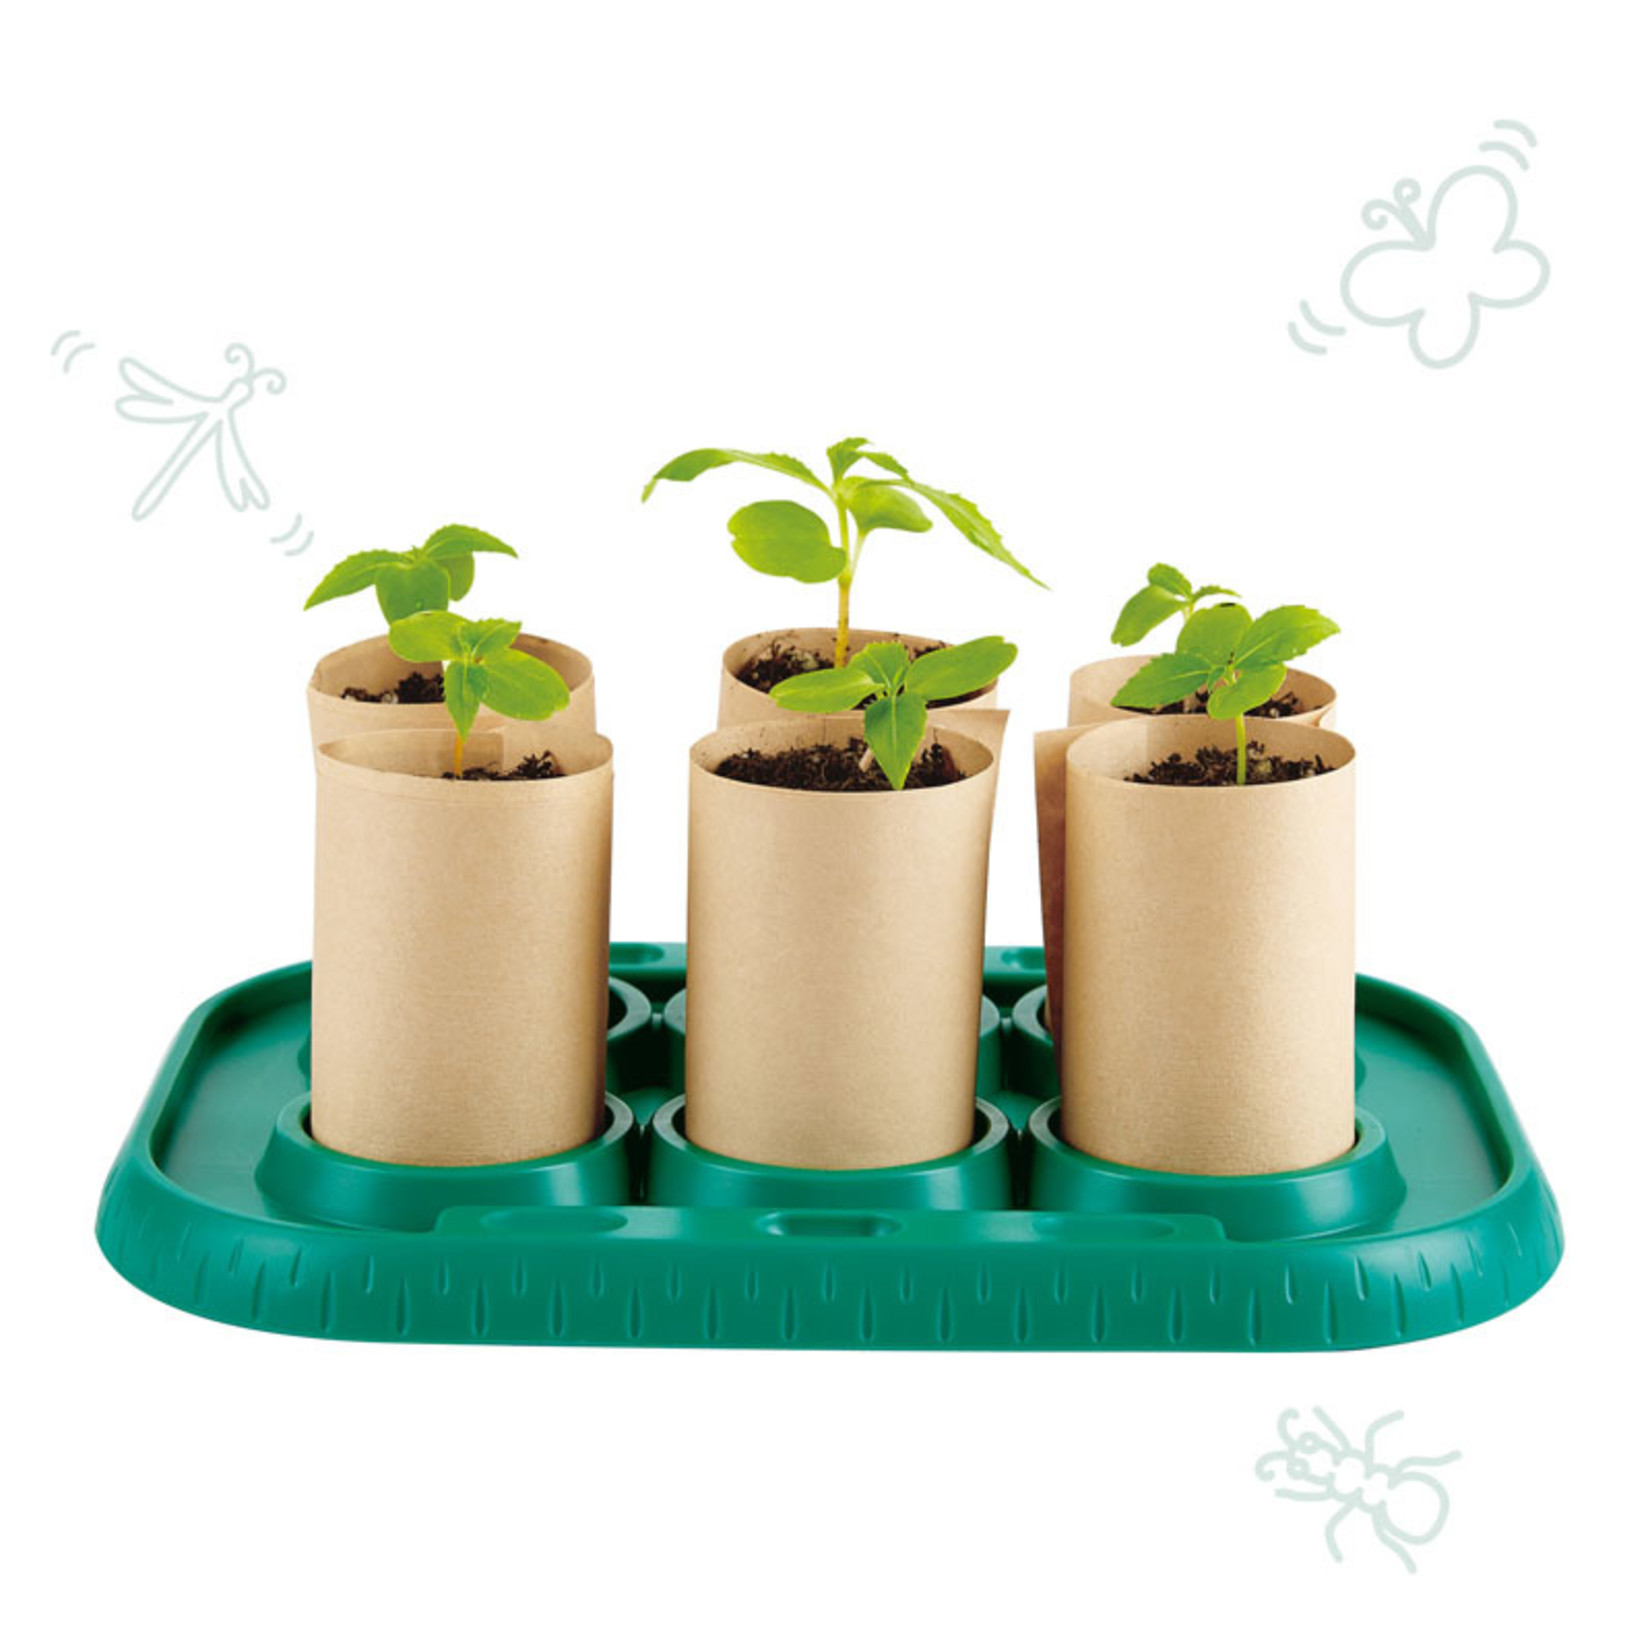 HAPE GROWING  GARDENS GREENHOUSE